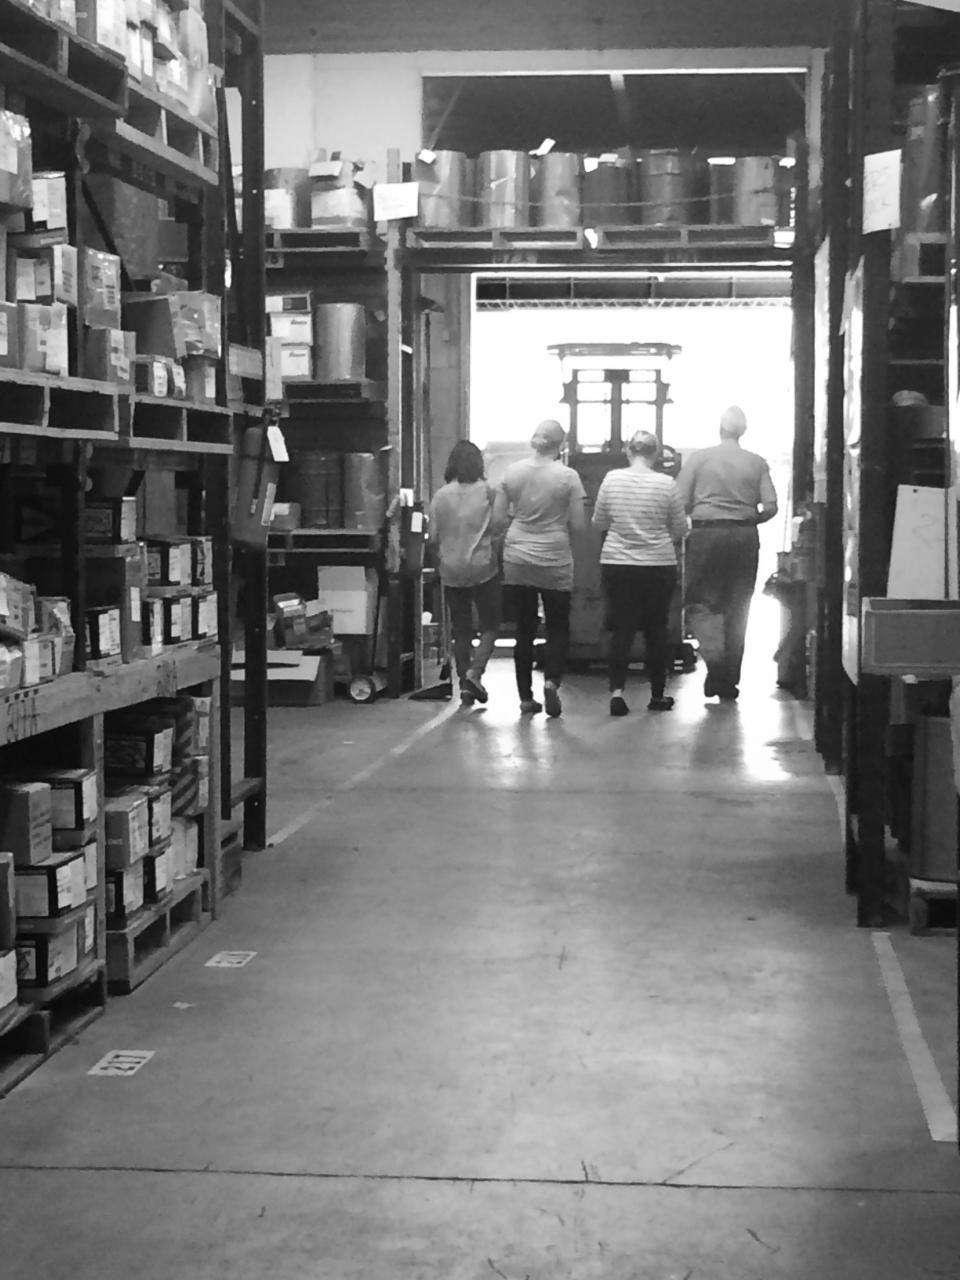 Freeway Fasteners, Inc - hardware store  | Photo 3 of 10 | Address: 15512 Vermont Ave, Paramount, CA 90723, USA | Phone: (562) 634-4510